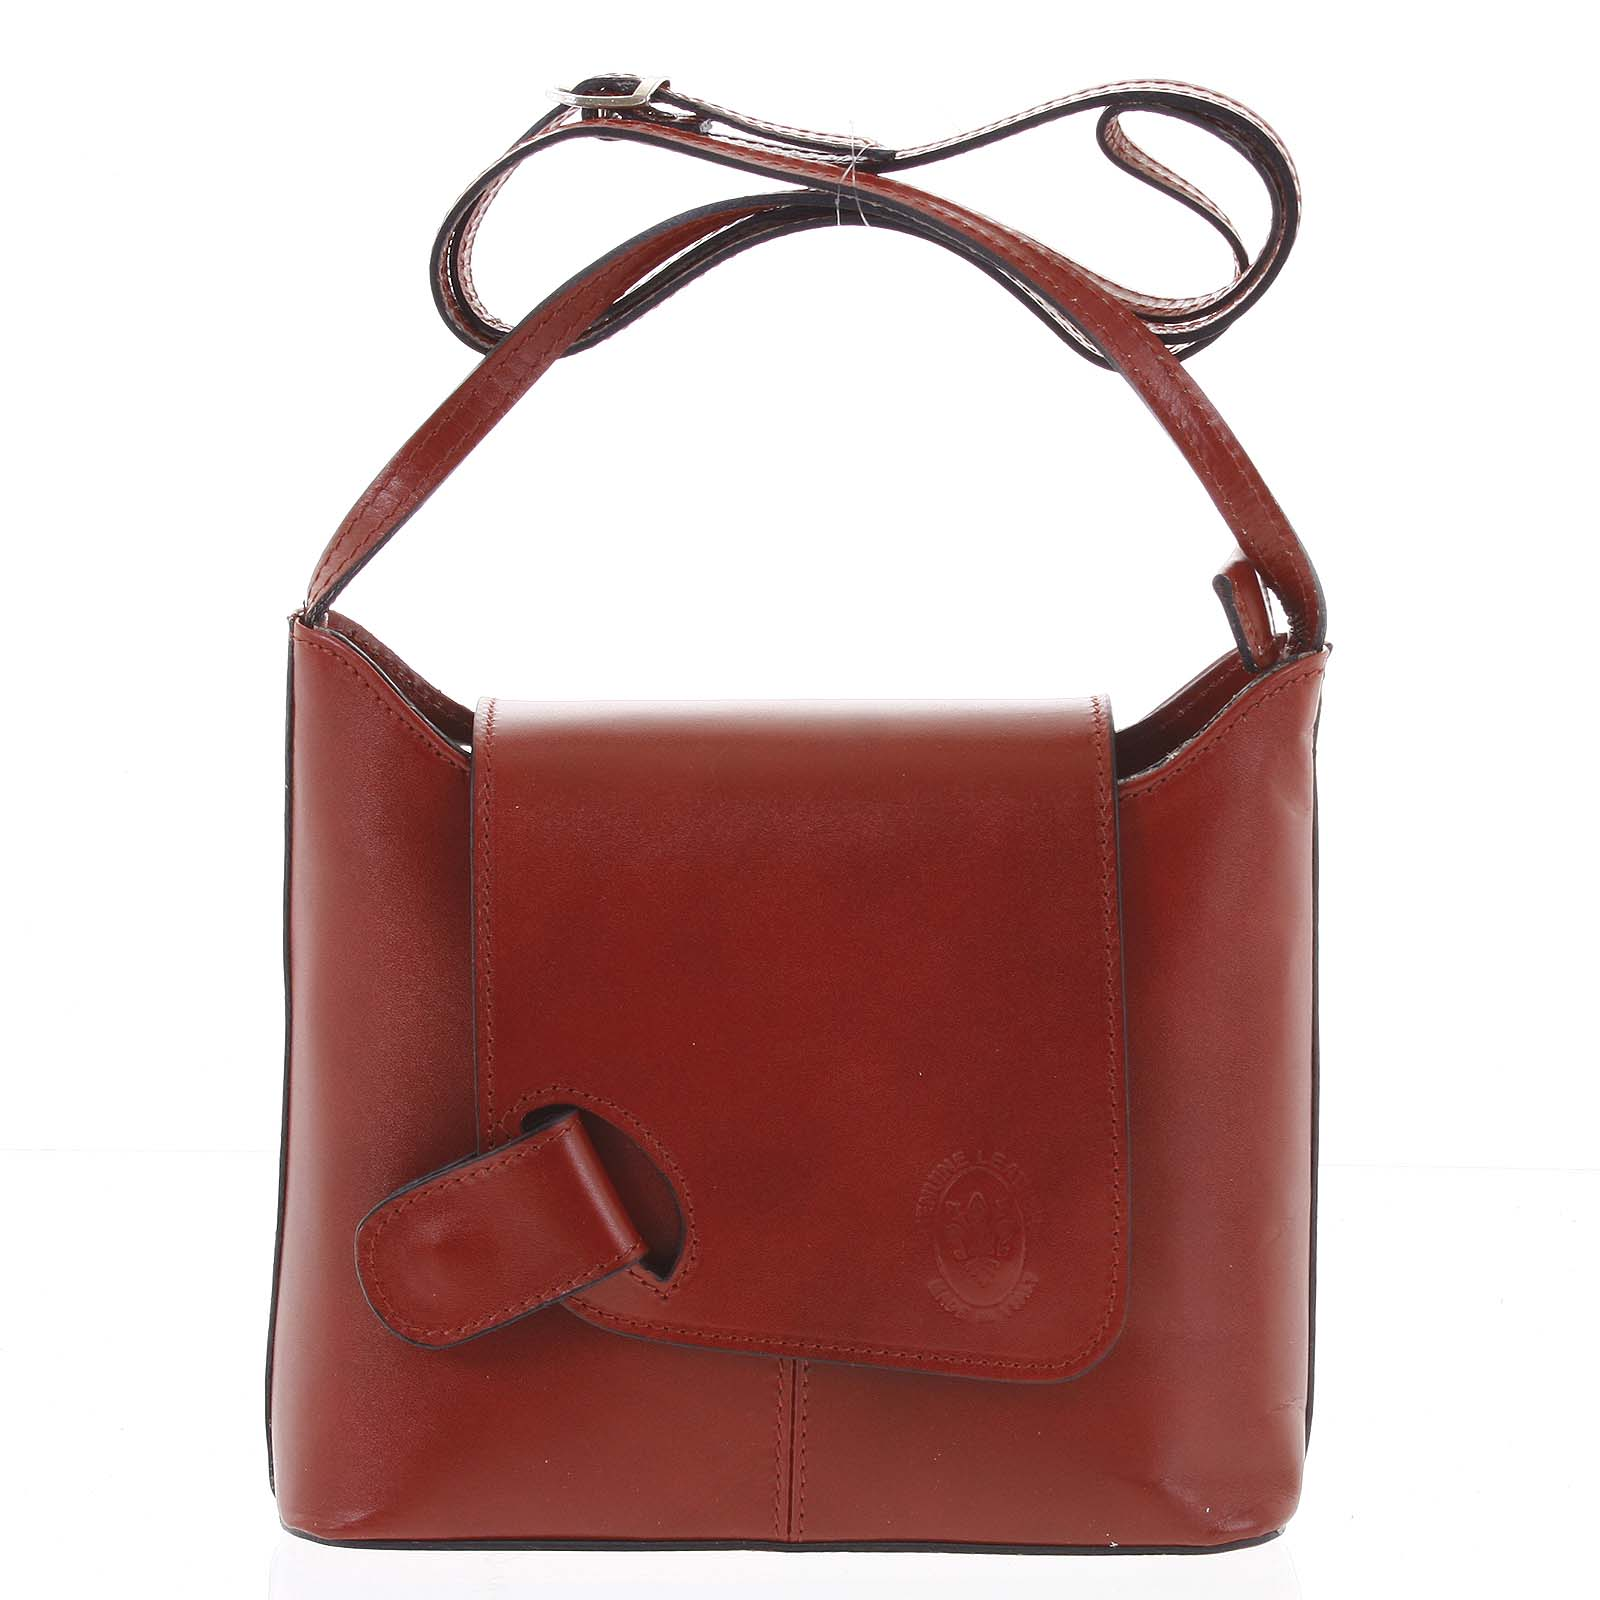 Dámska kožená crossbody kabelka červená - ItalY Misty Dark